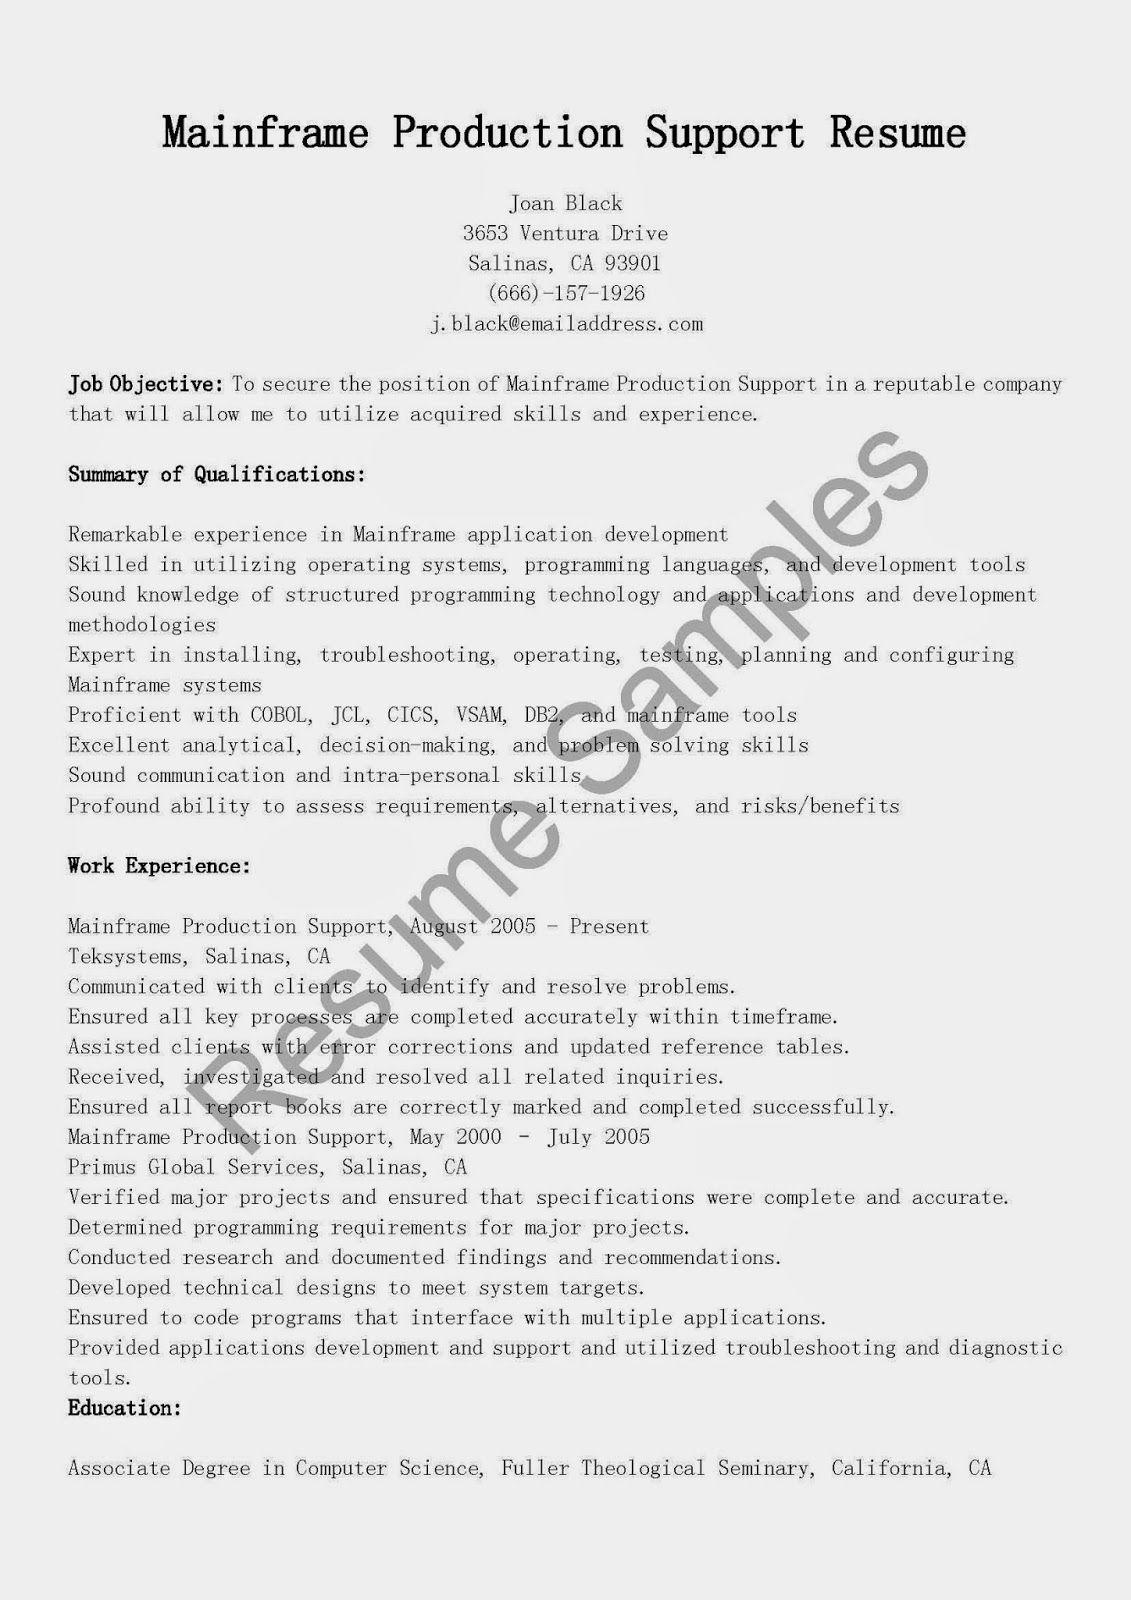 Mainframe Production Support Resume Sample Resume Best Resume Resume Format